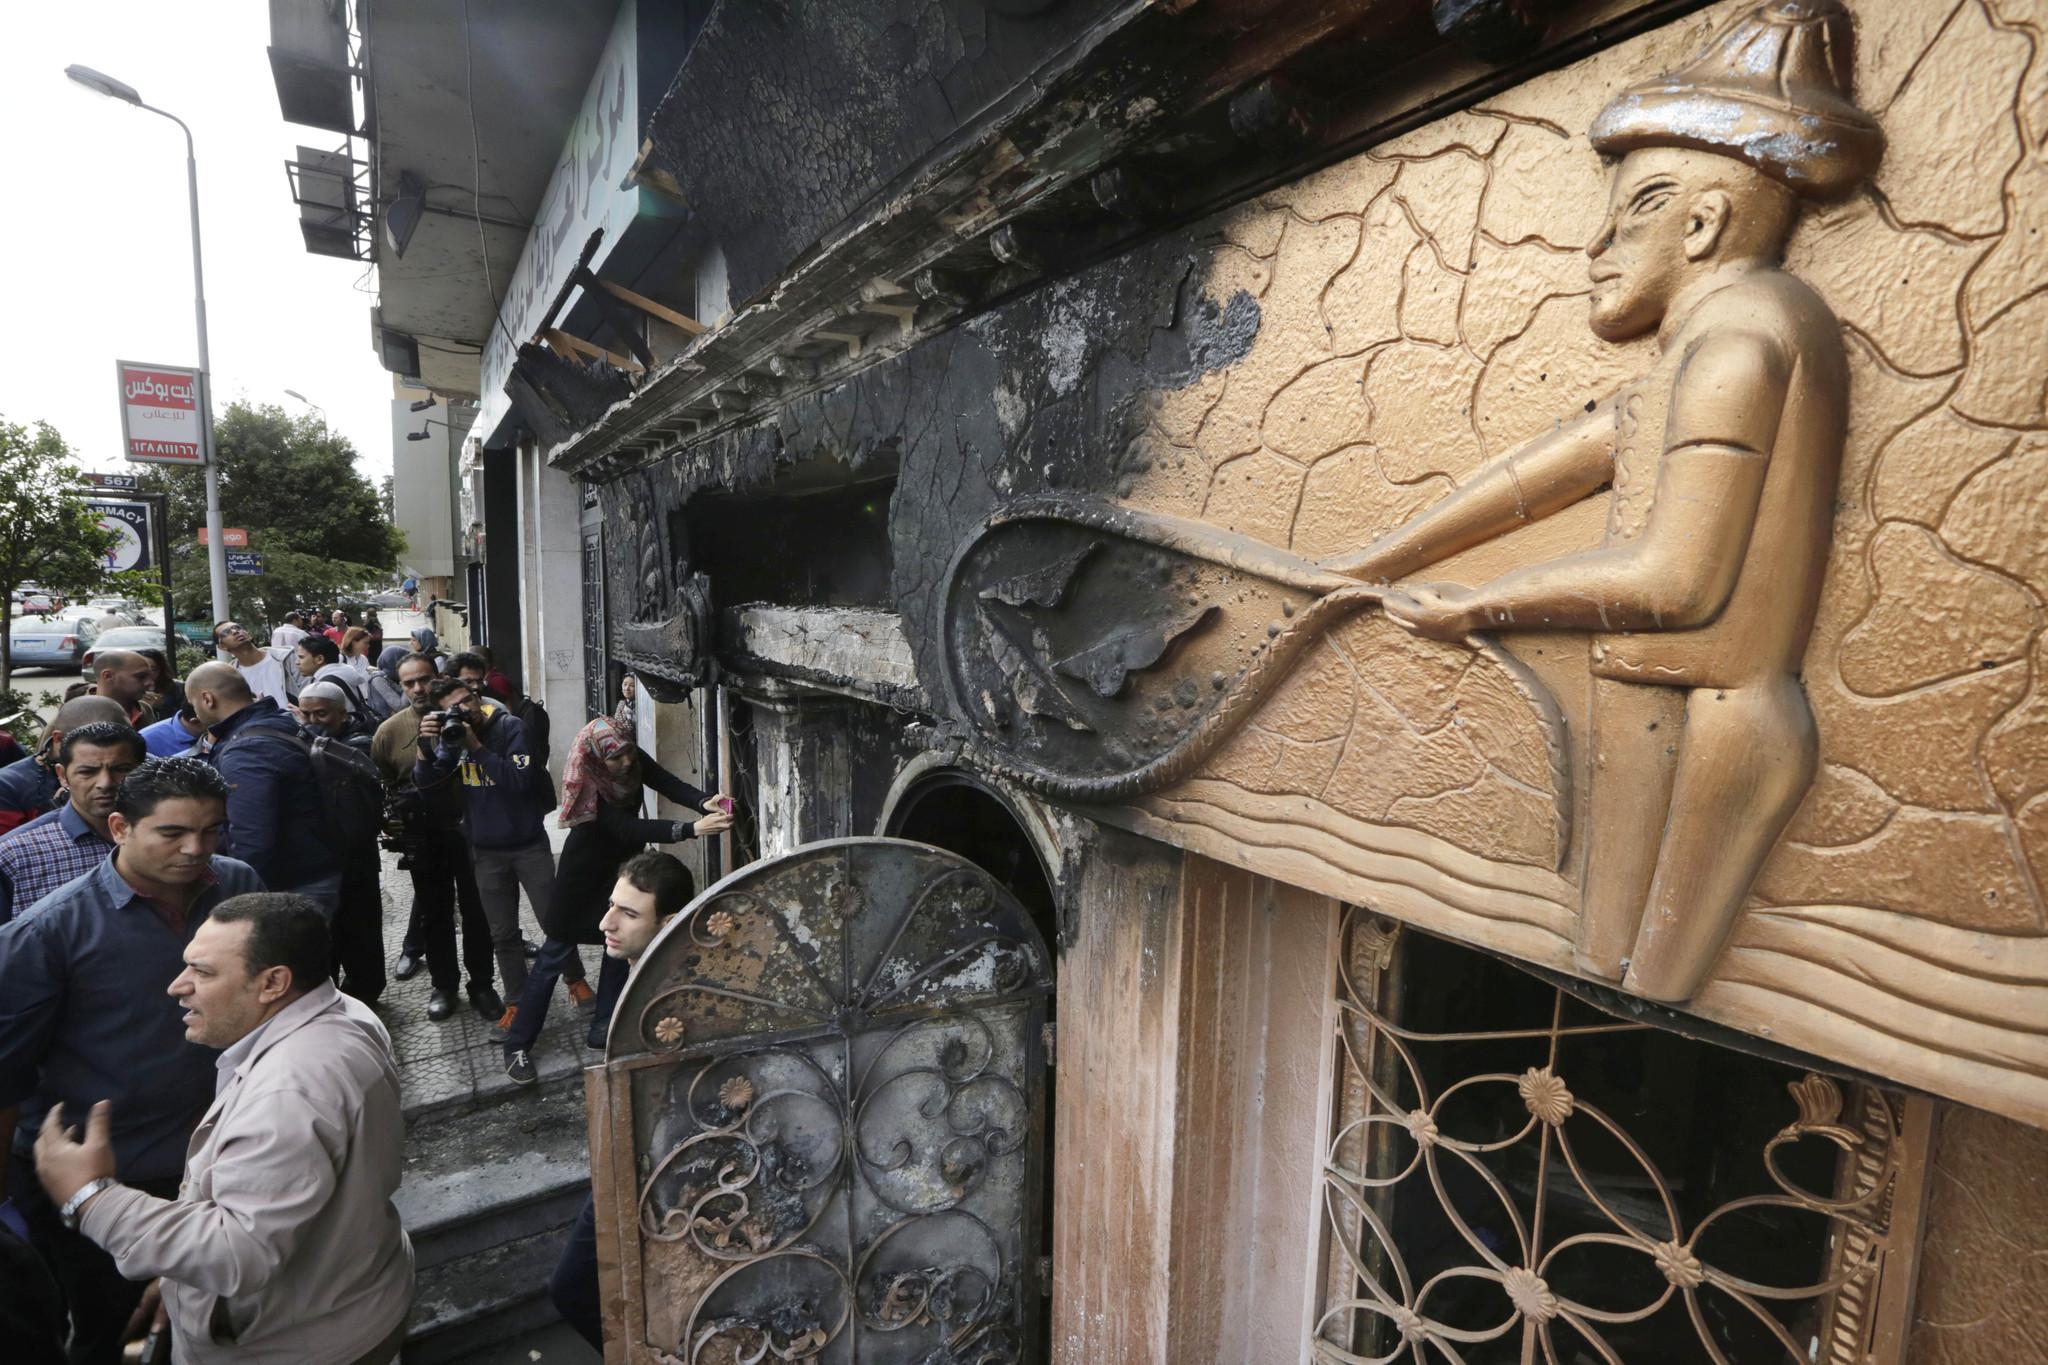 Egypt: 16 killed in firebomb attack on Cairo nightclub